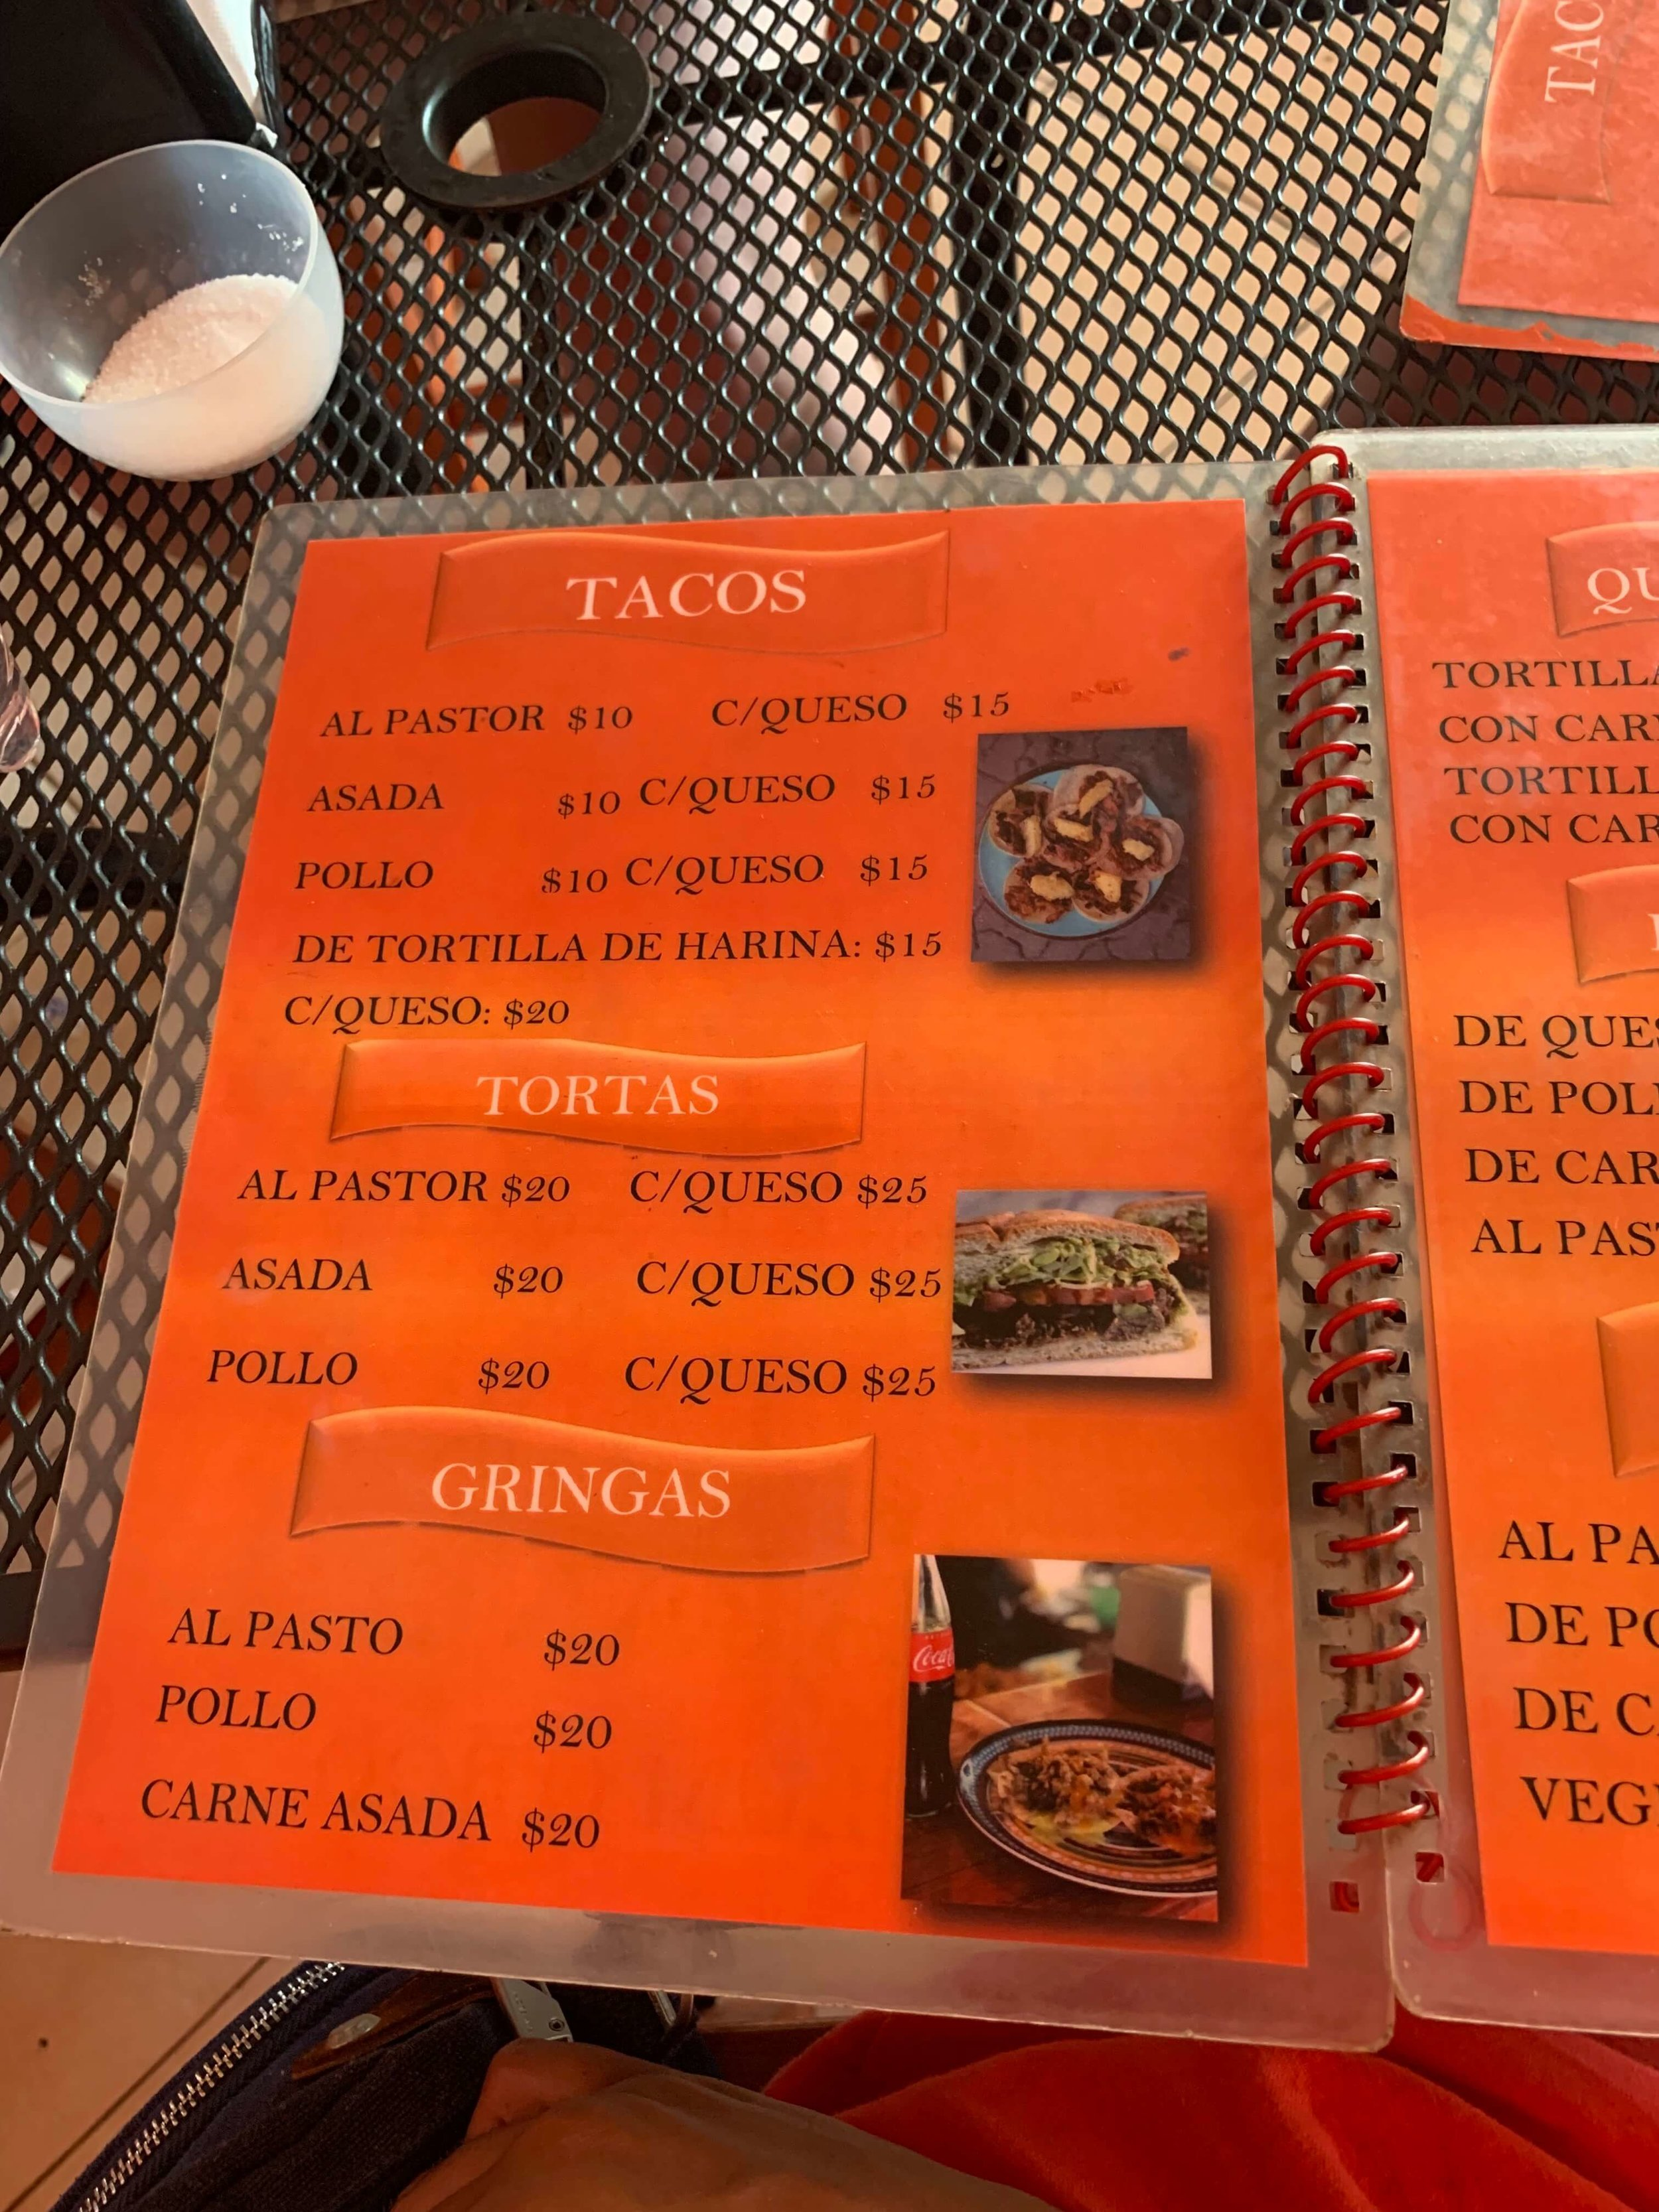 Antojitos la chiapaneca menu | Tulum Pueblo